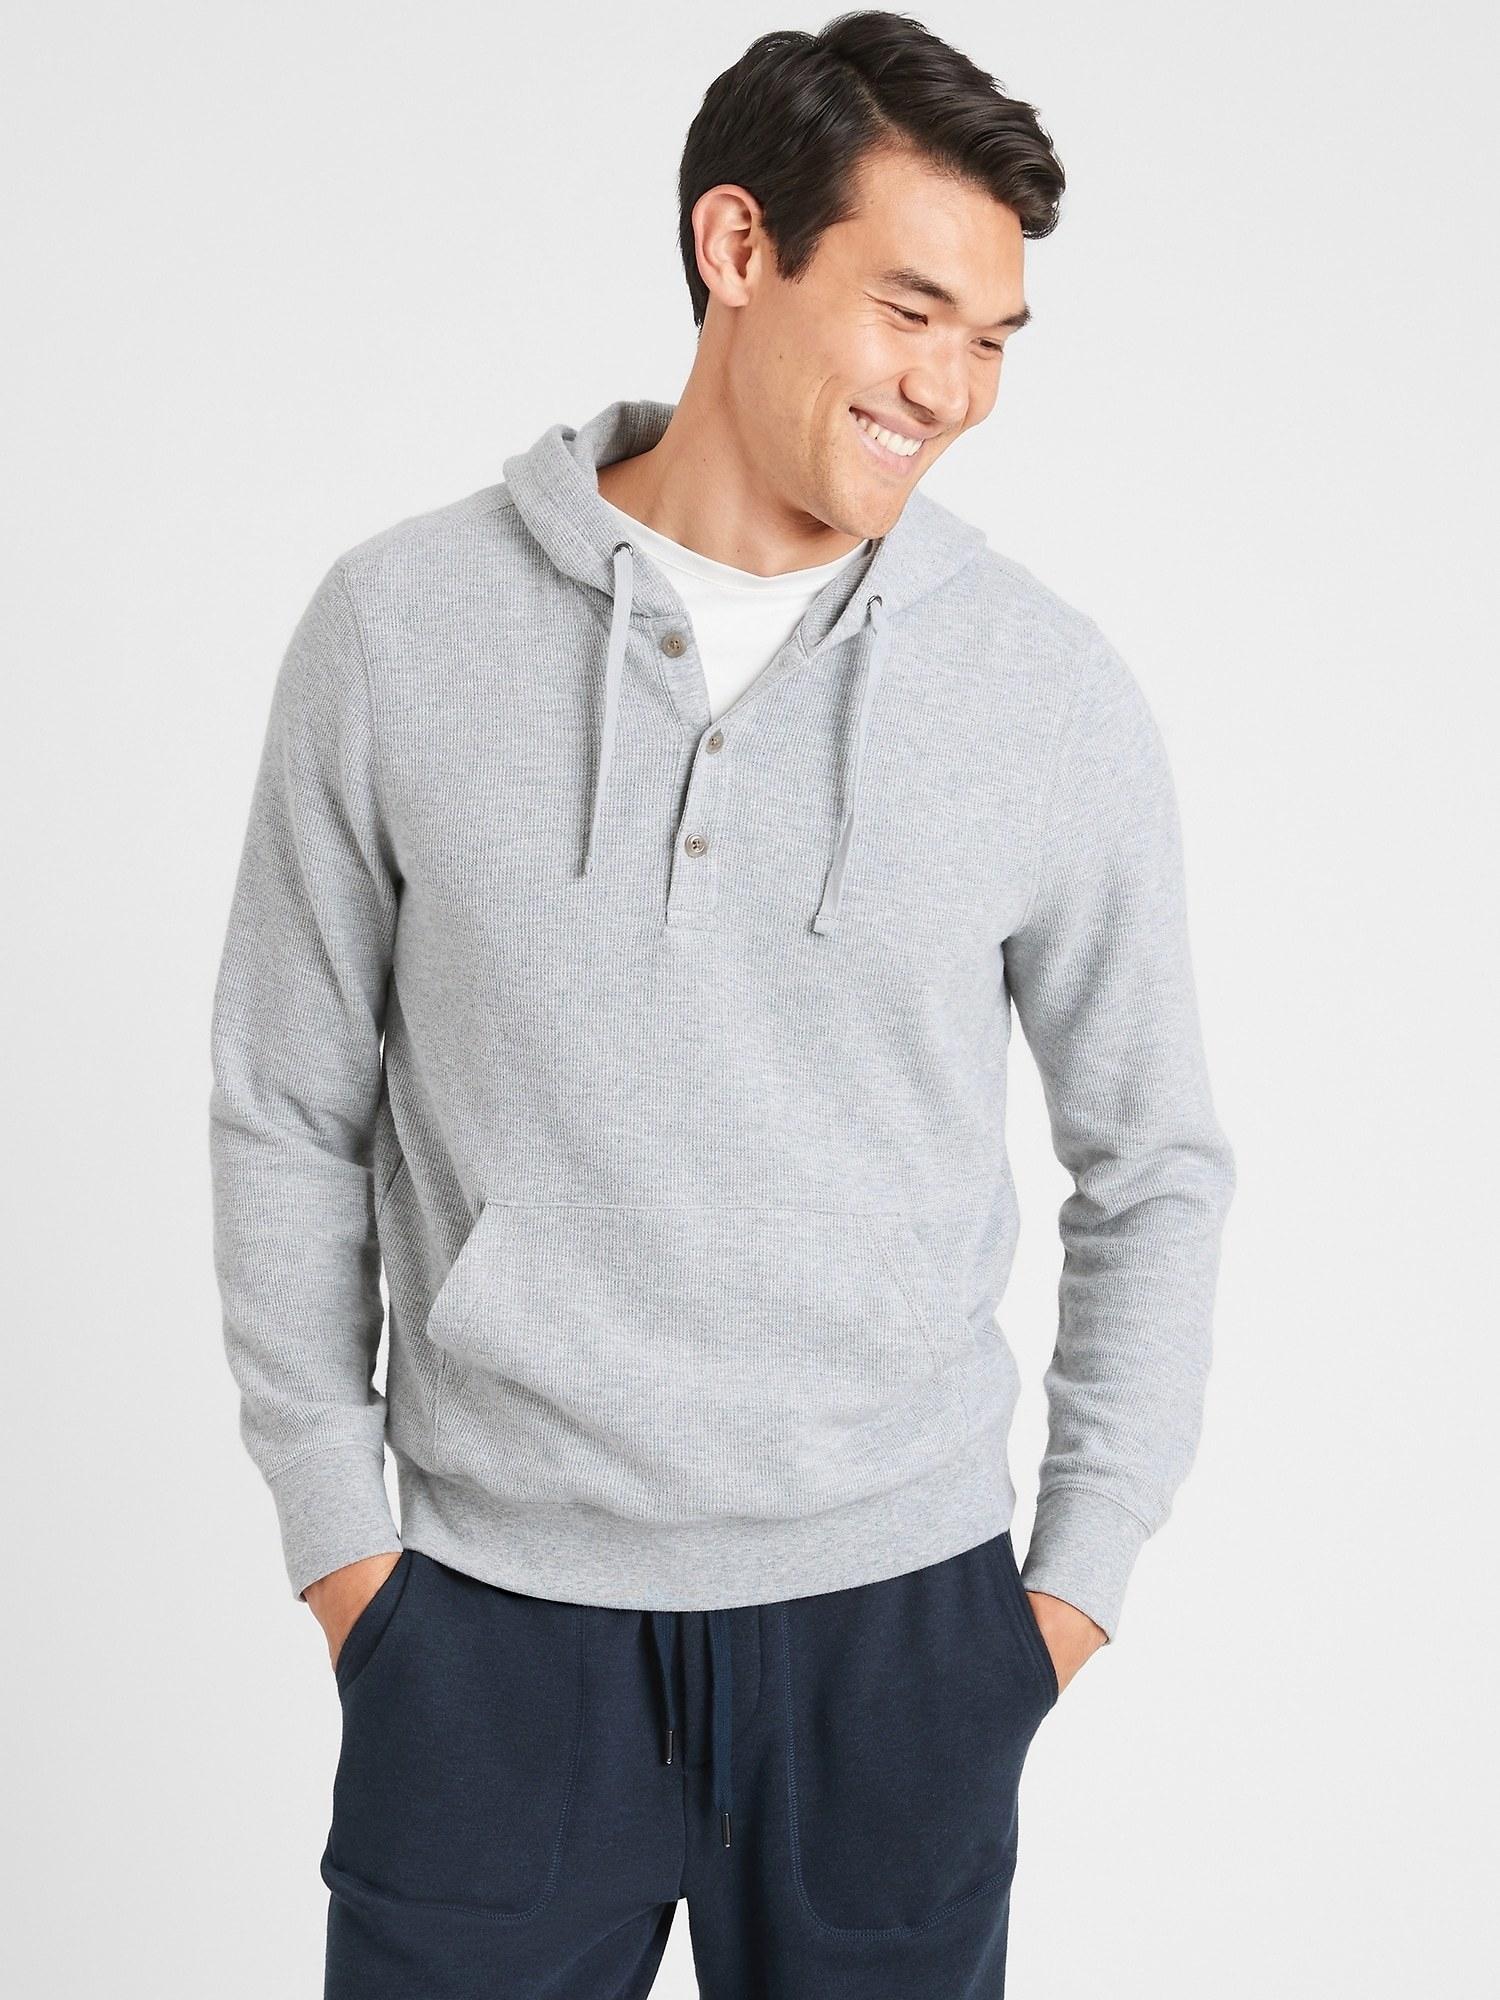 model wearing eco hoodie sweatshirt